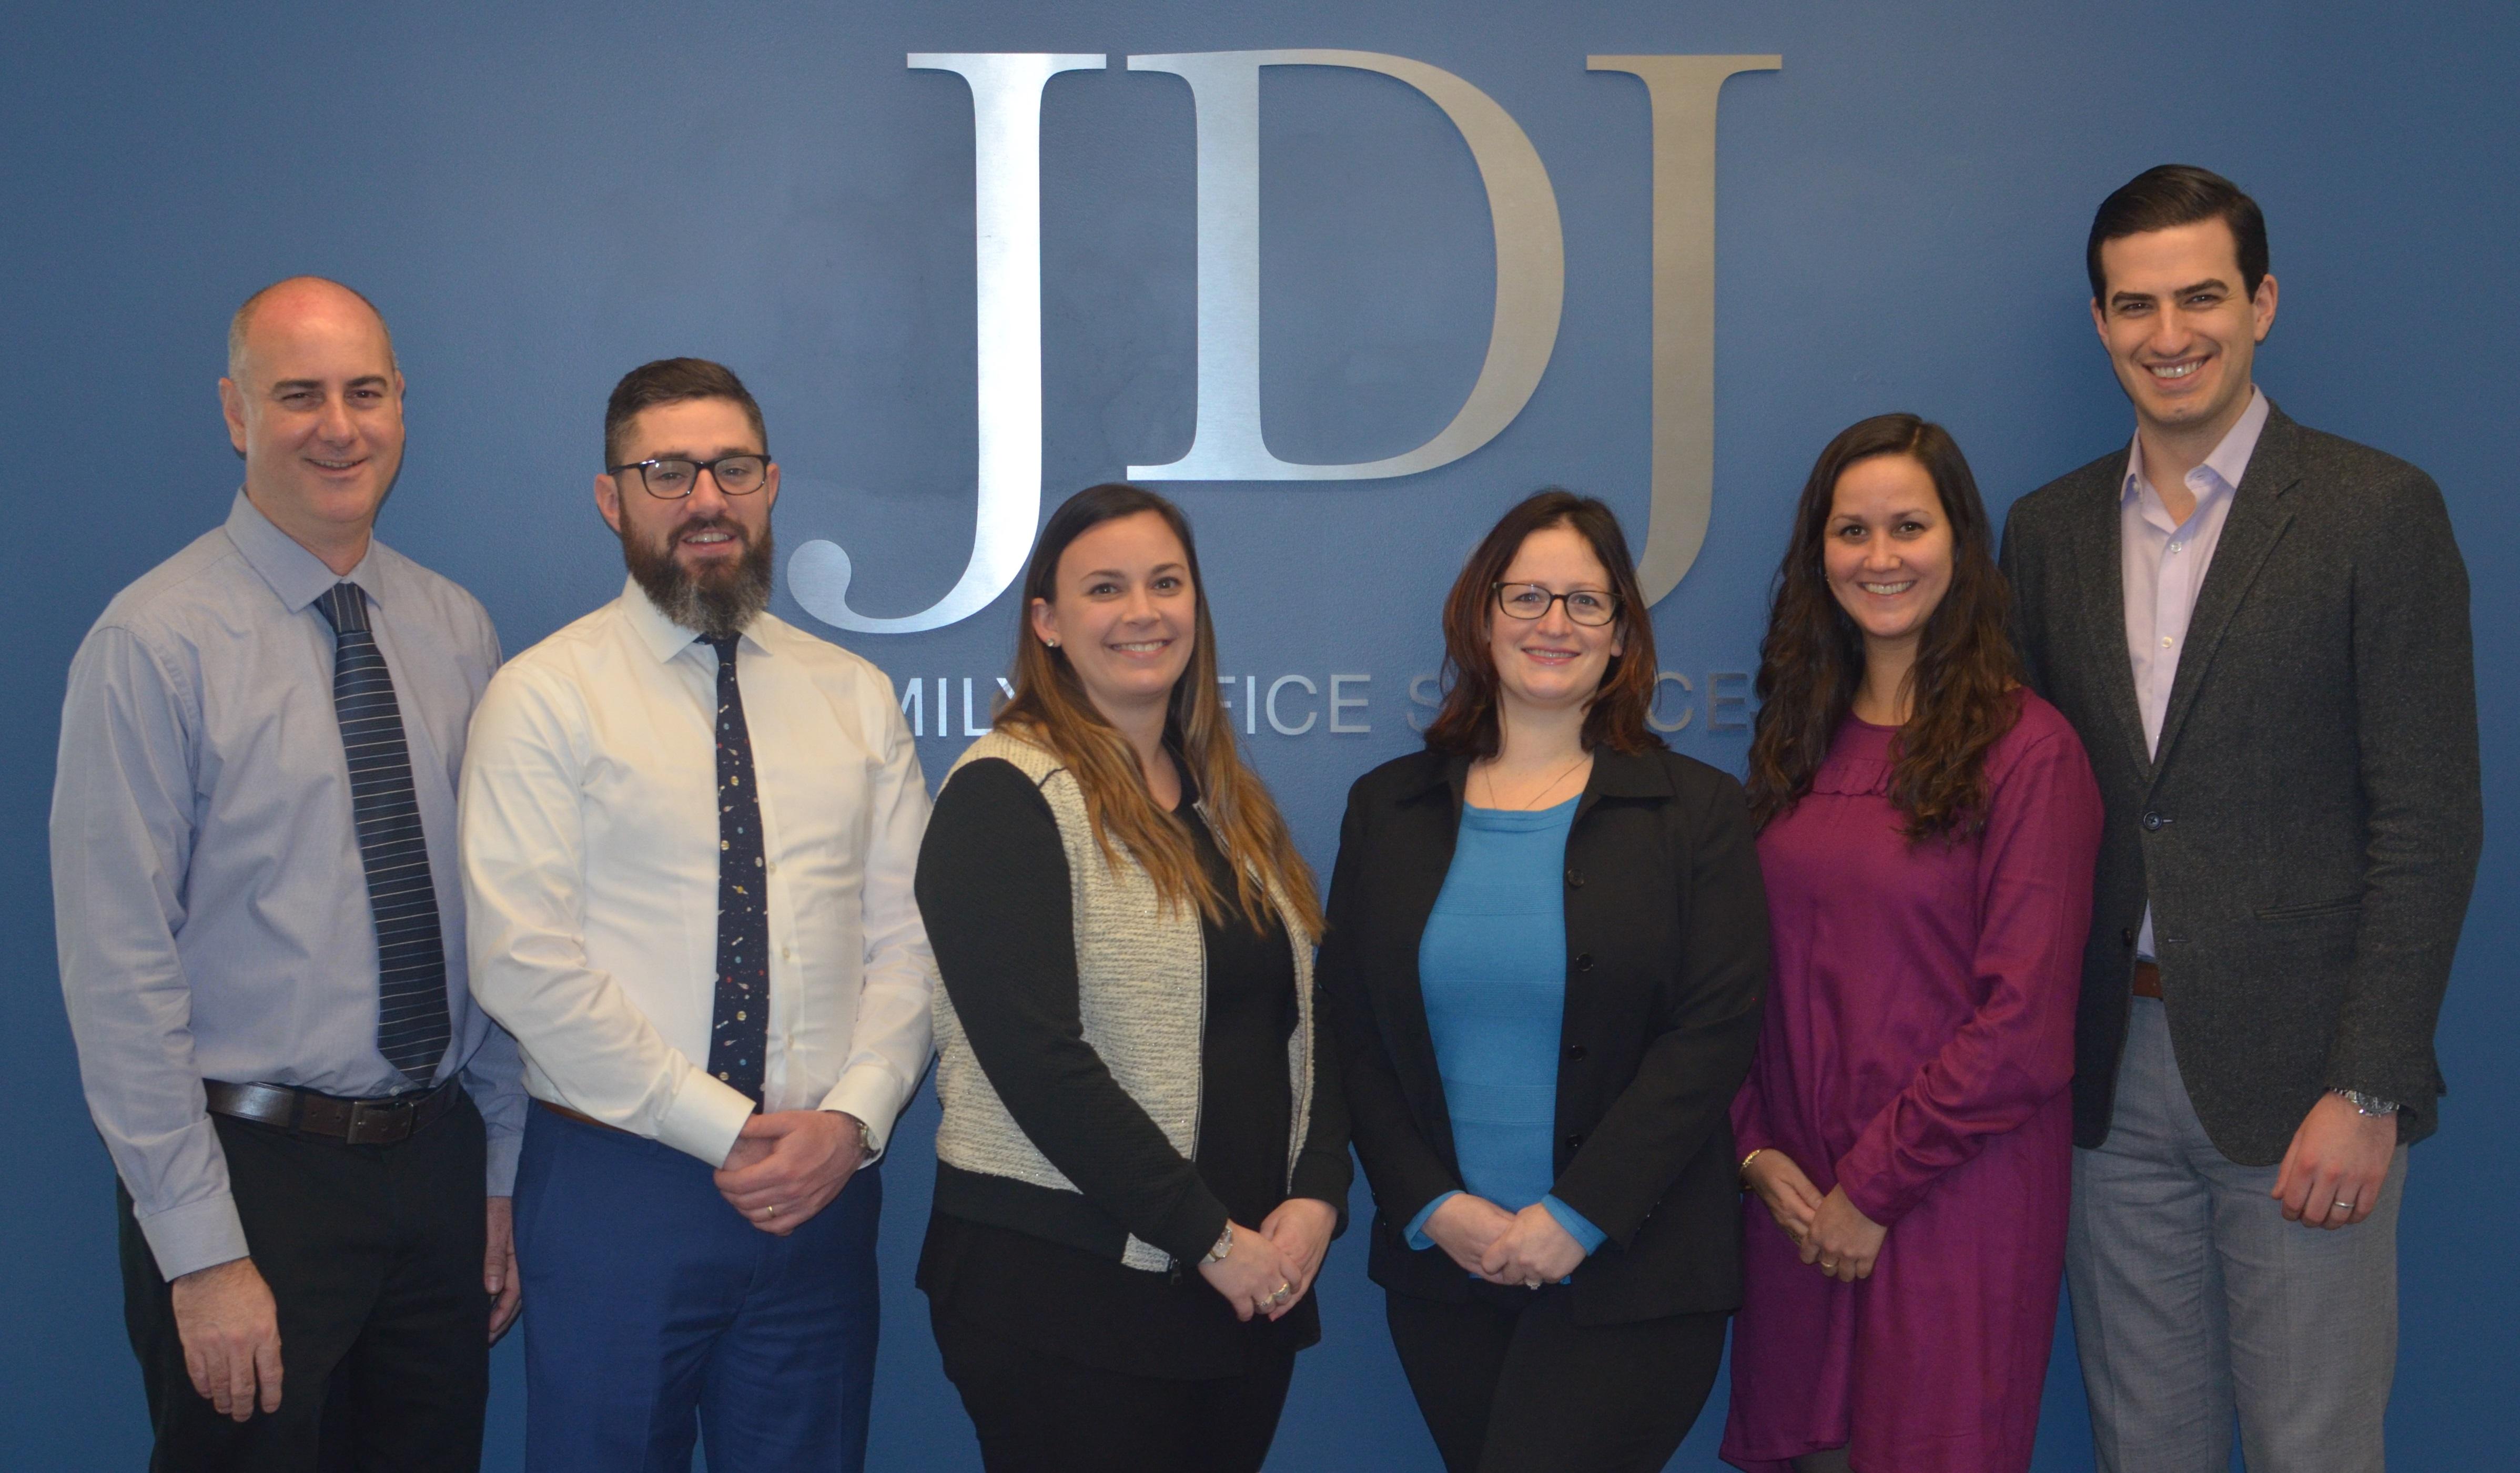 Congratulations to these JDJ team members on their promotions (l to r): Shawn Whitney, Jeff Burke, Brittany Quarantello, Bekah Paradise, Mallory Garneau, Brett Dietz.